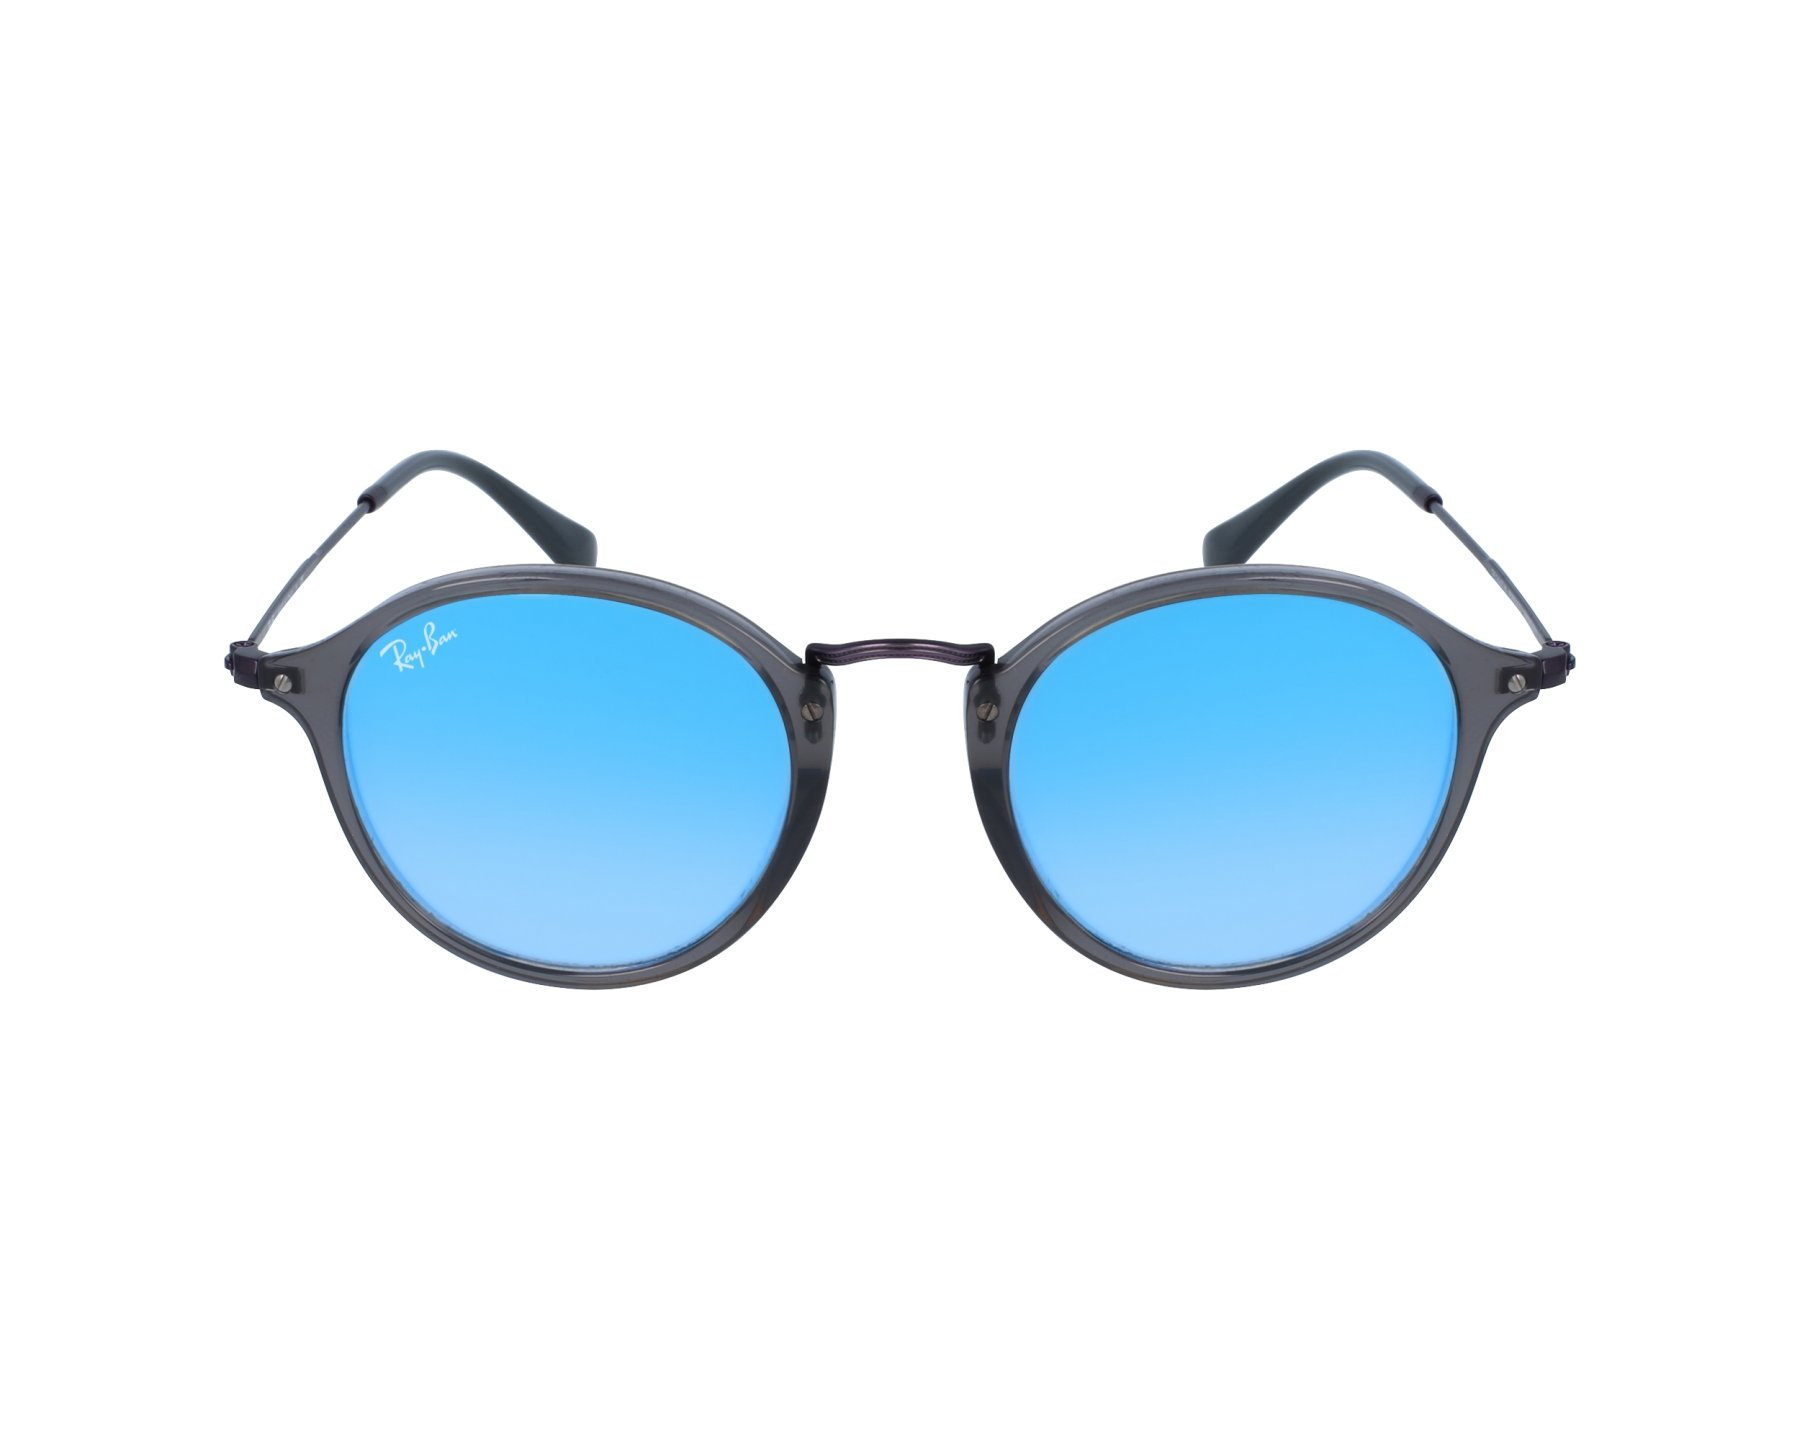 lunette ray ban homme effet miroir